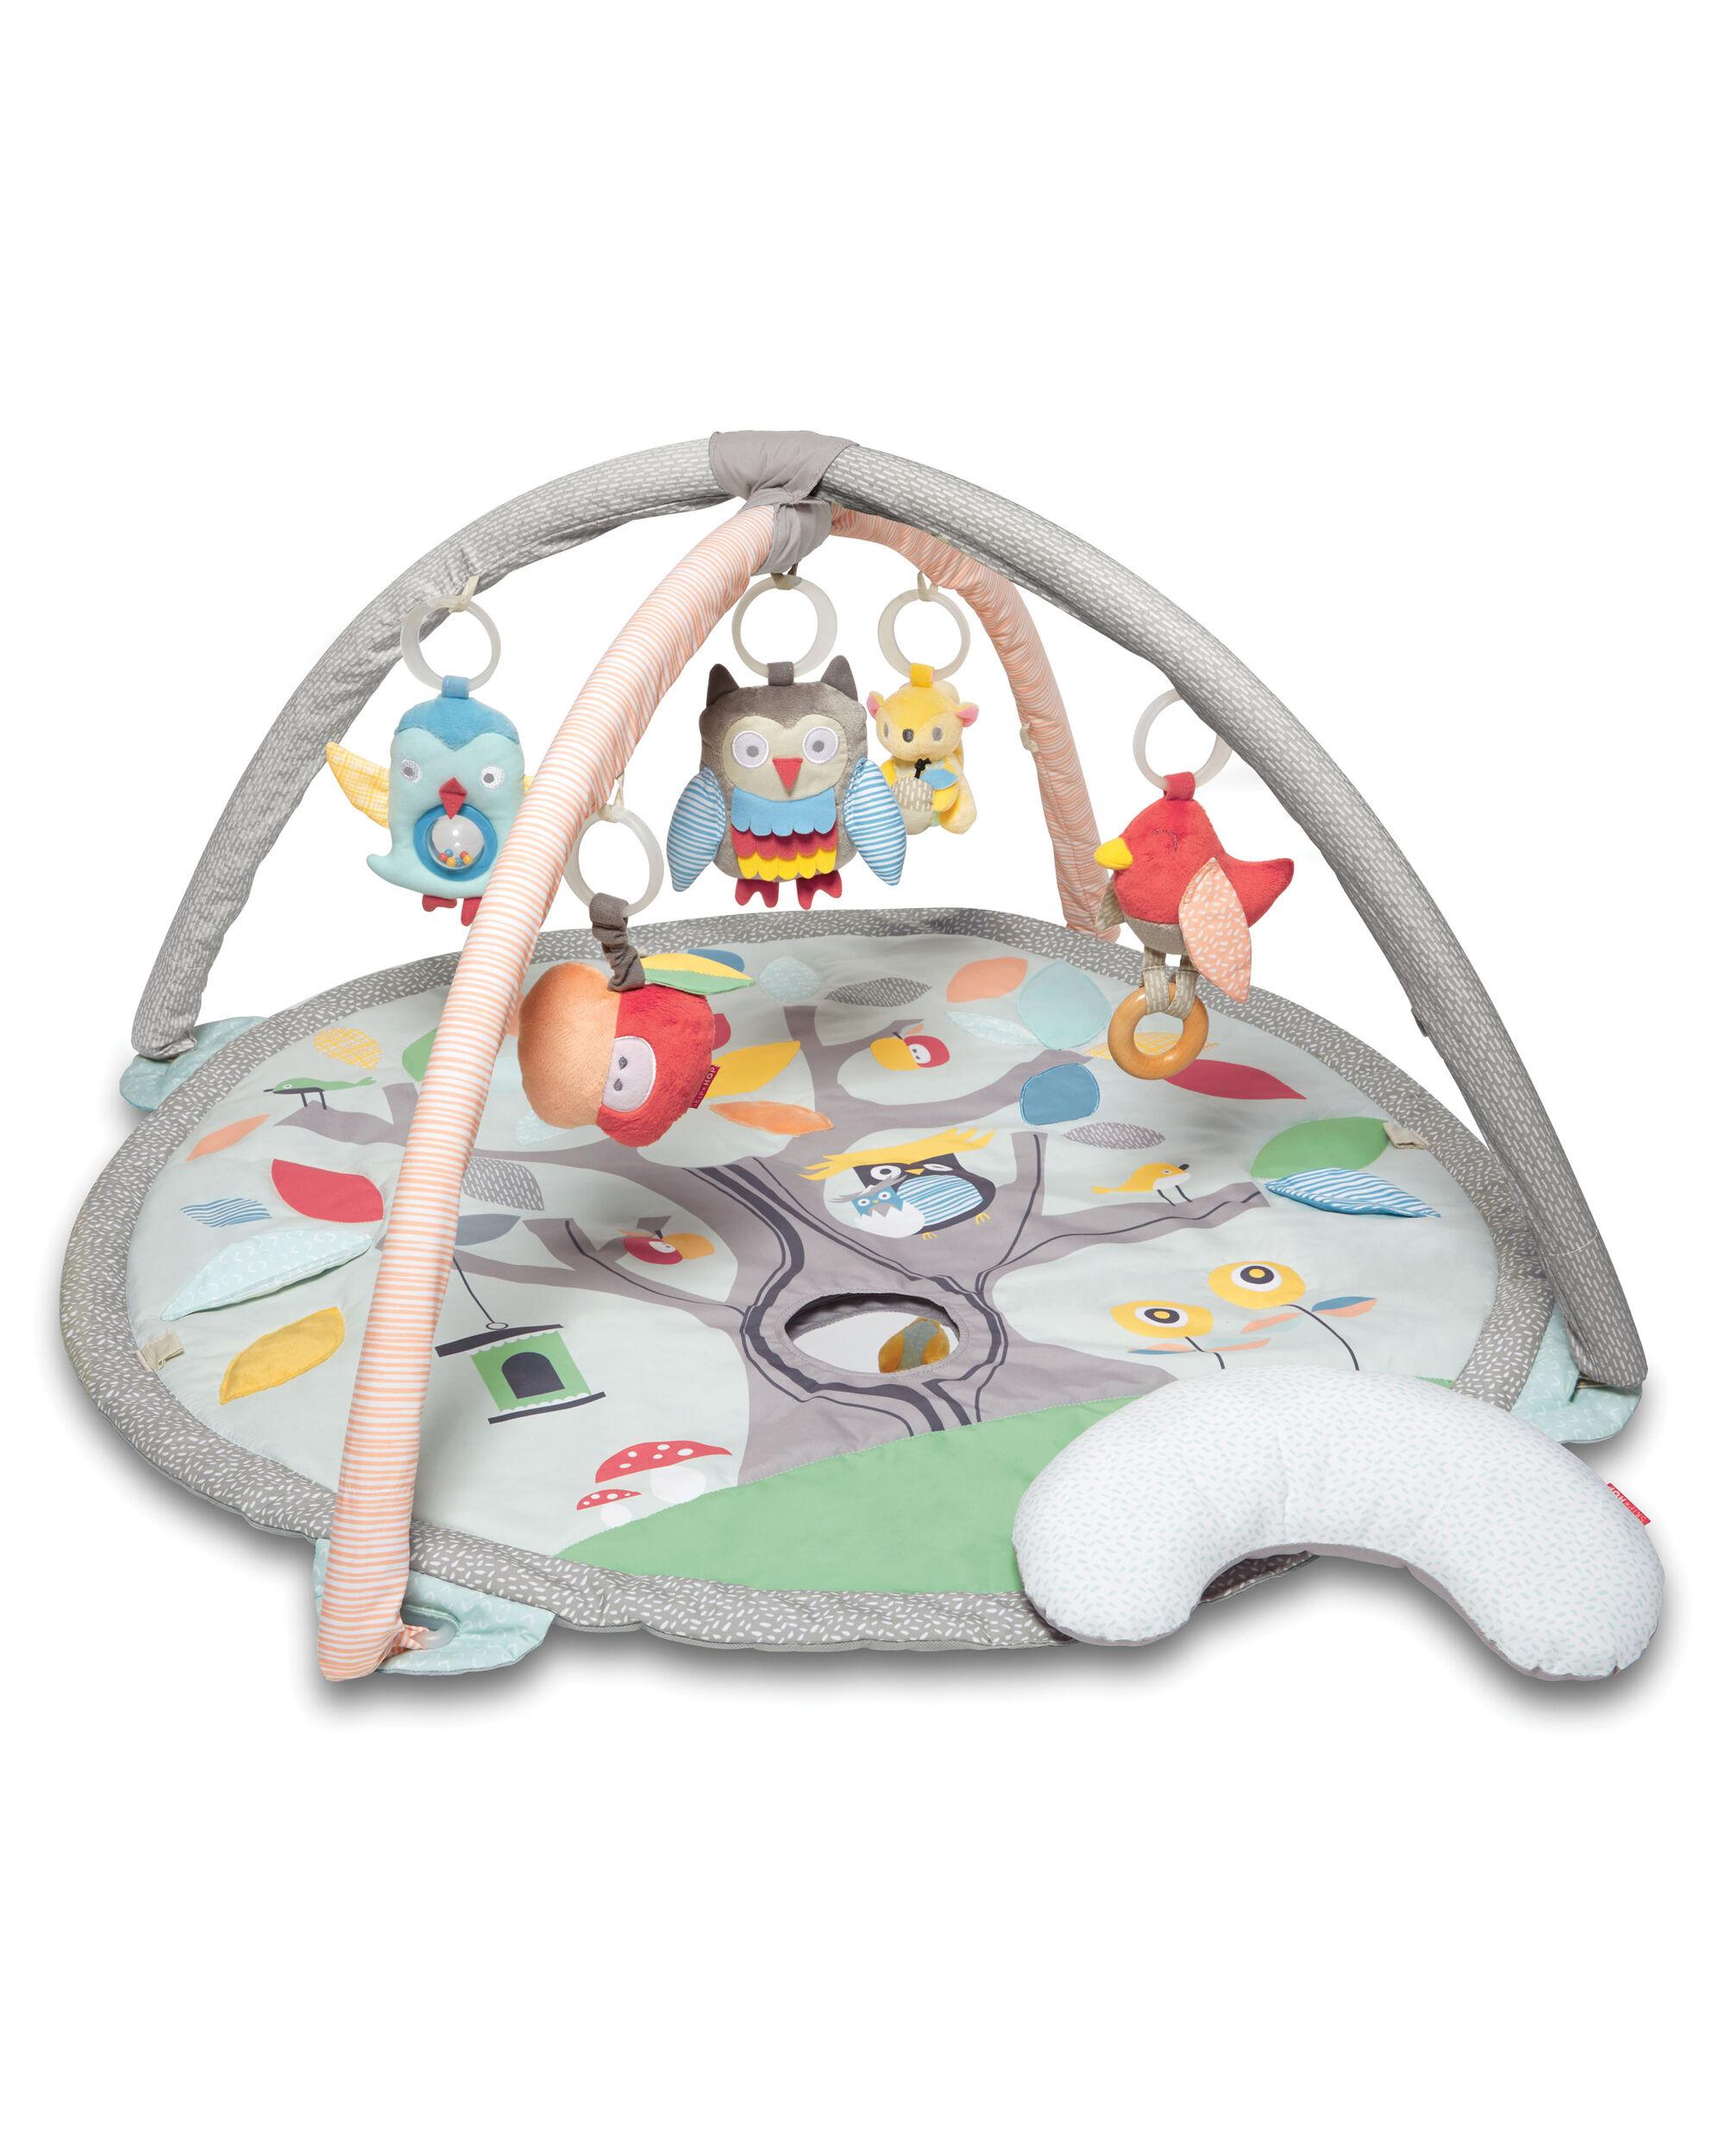 activity sound sensory baby play co square bontempi dp amazon uk mat jungle